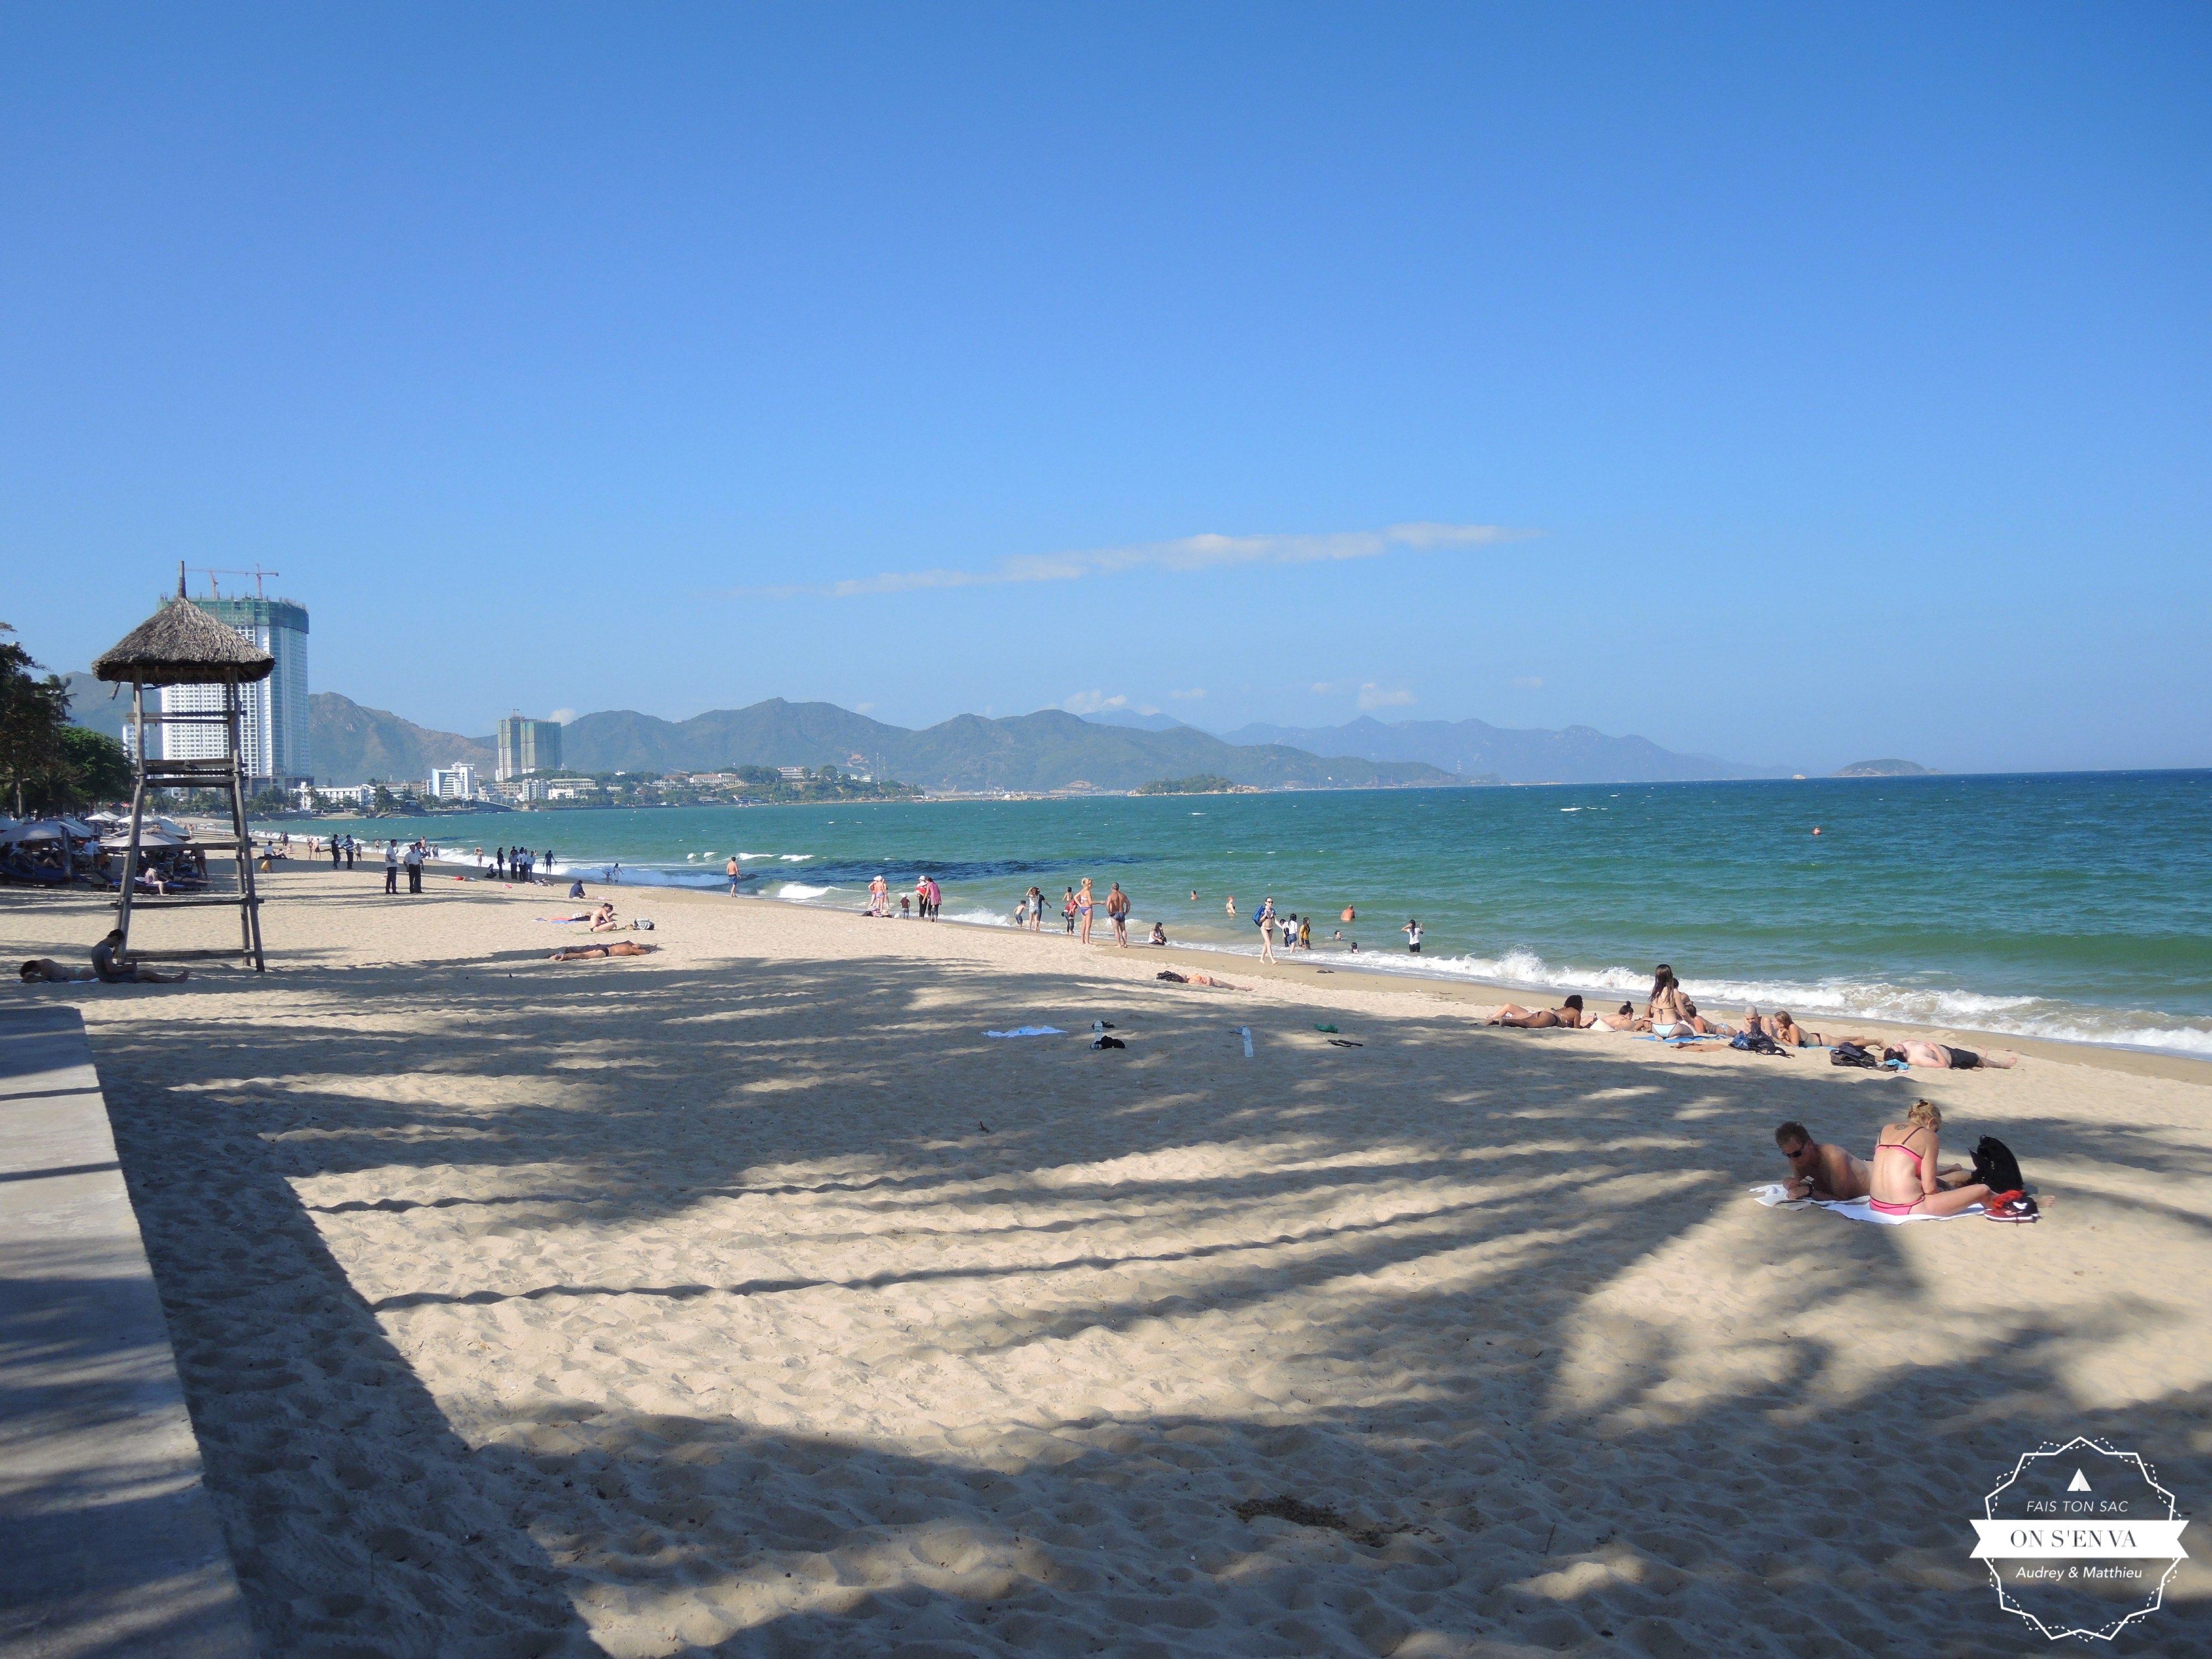 La plage de Nha Trang